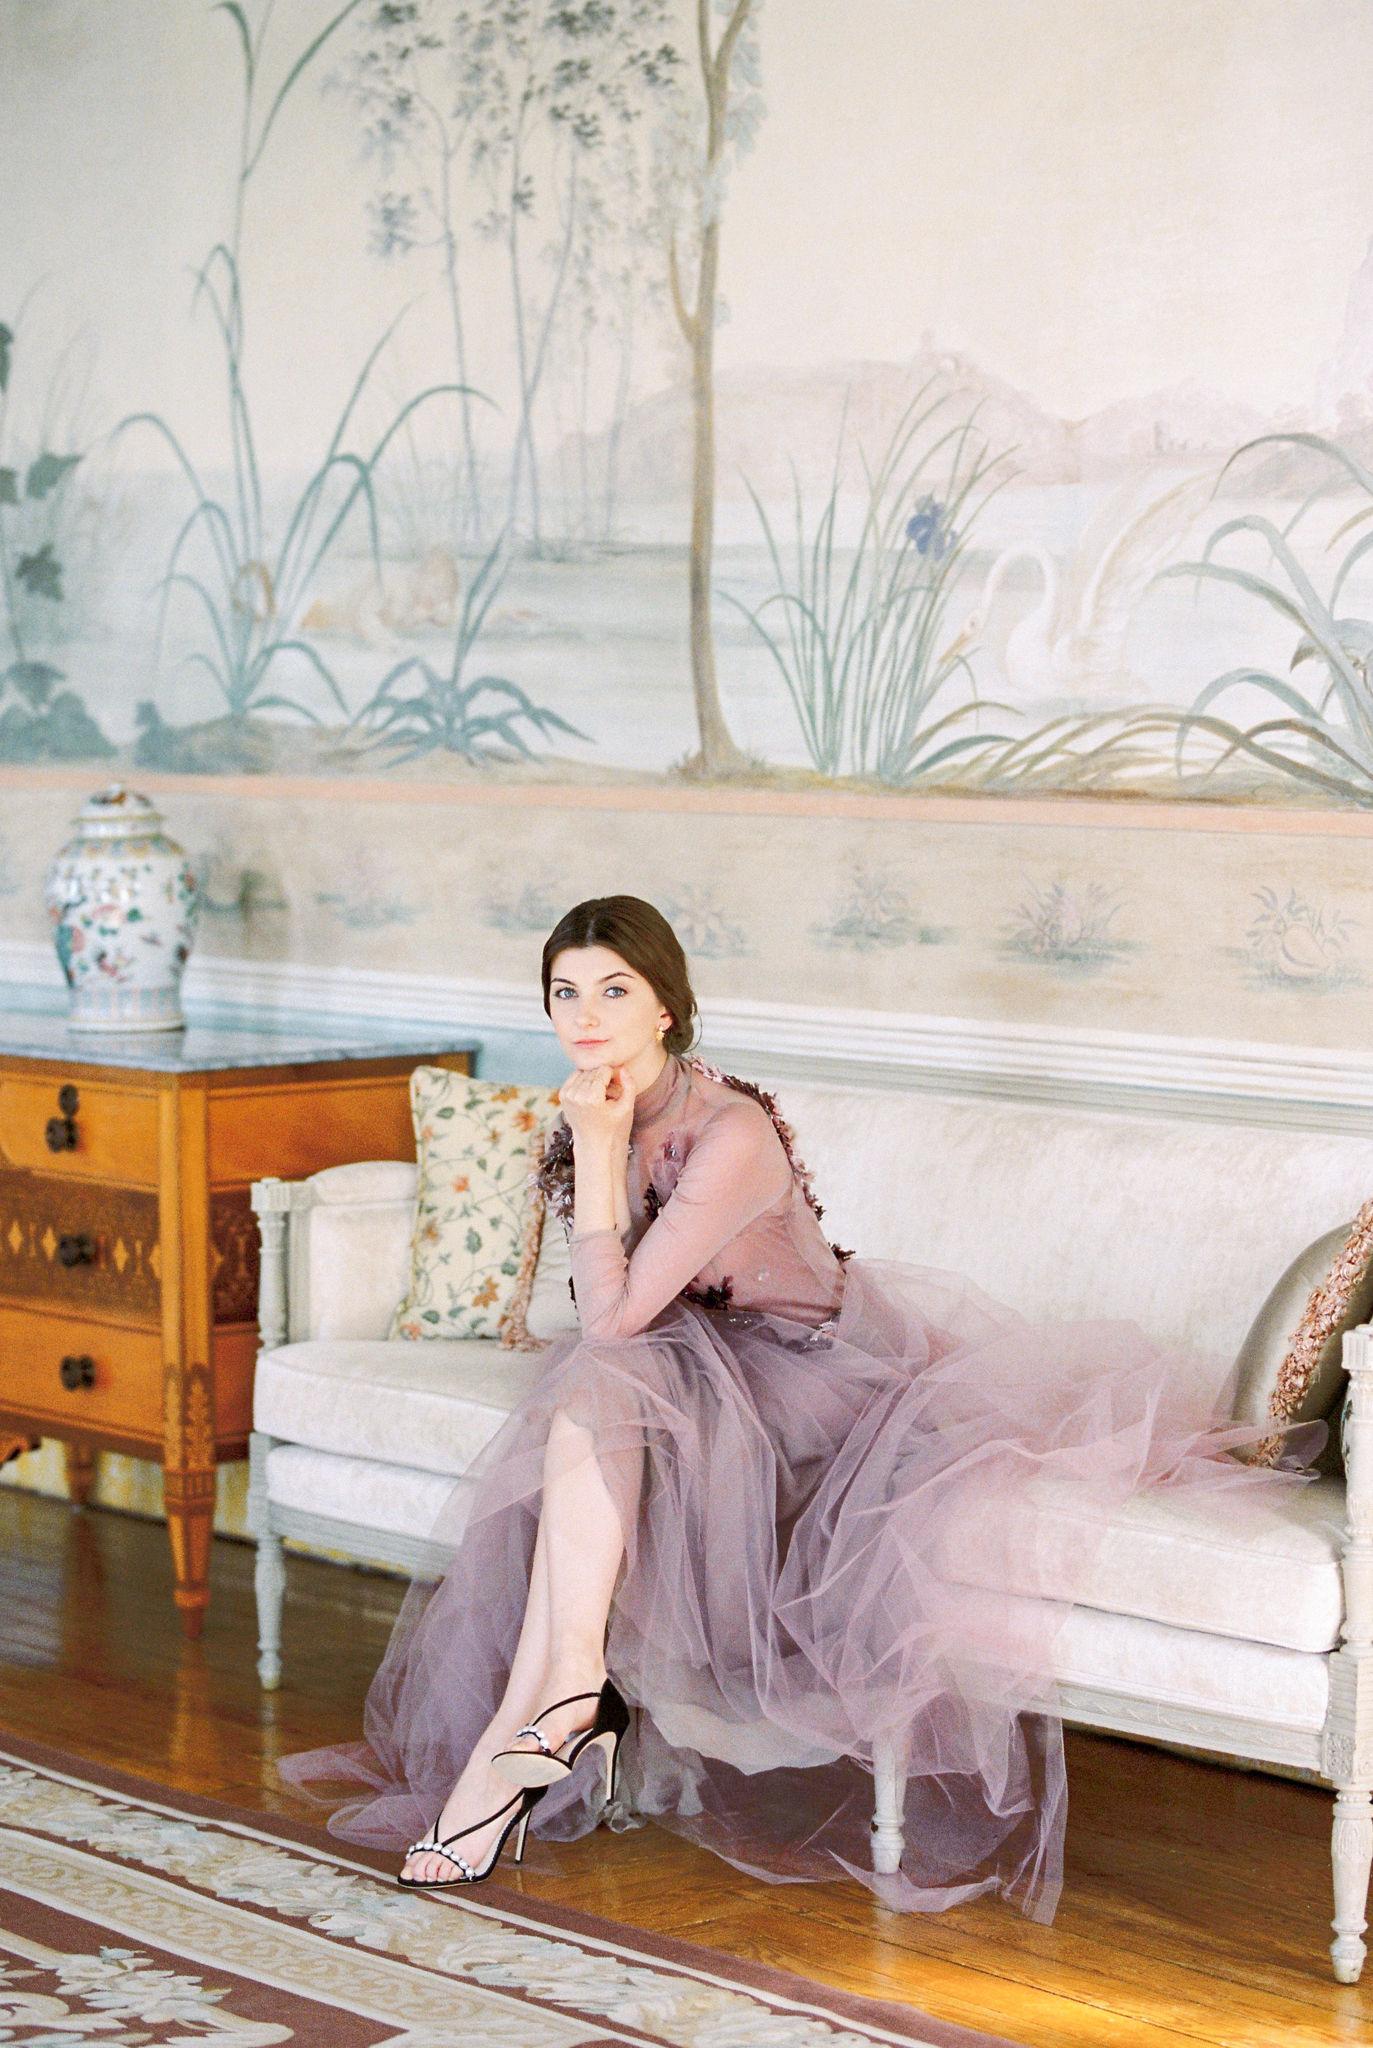 Chana Marelus Editorial Shoot Featuring The Shay Dress